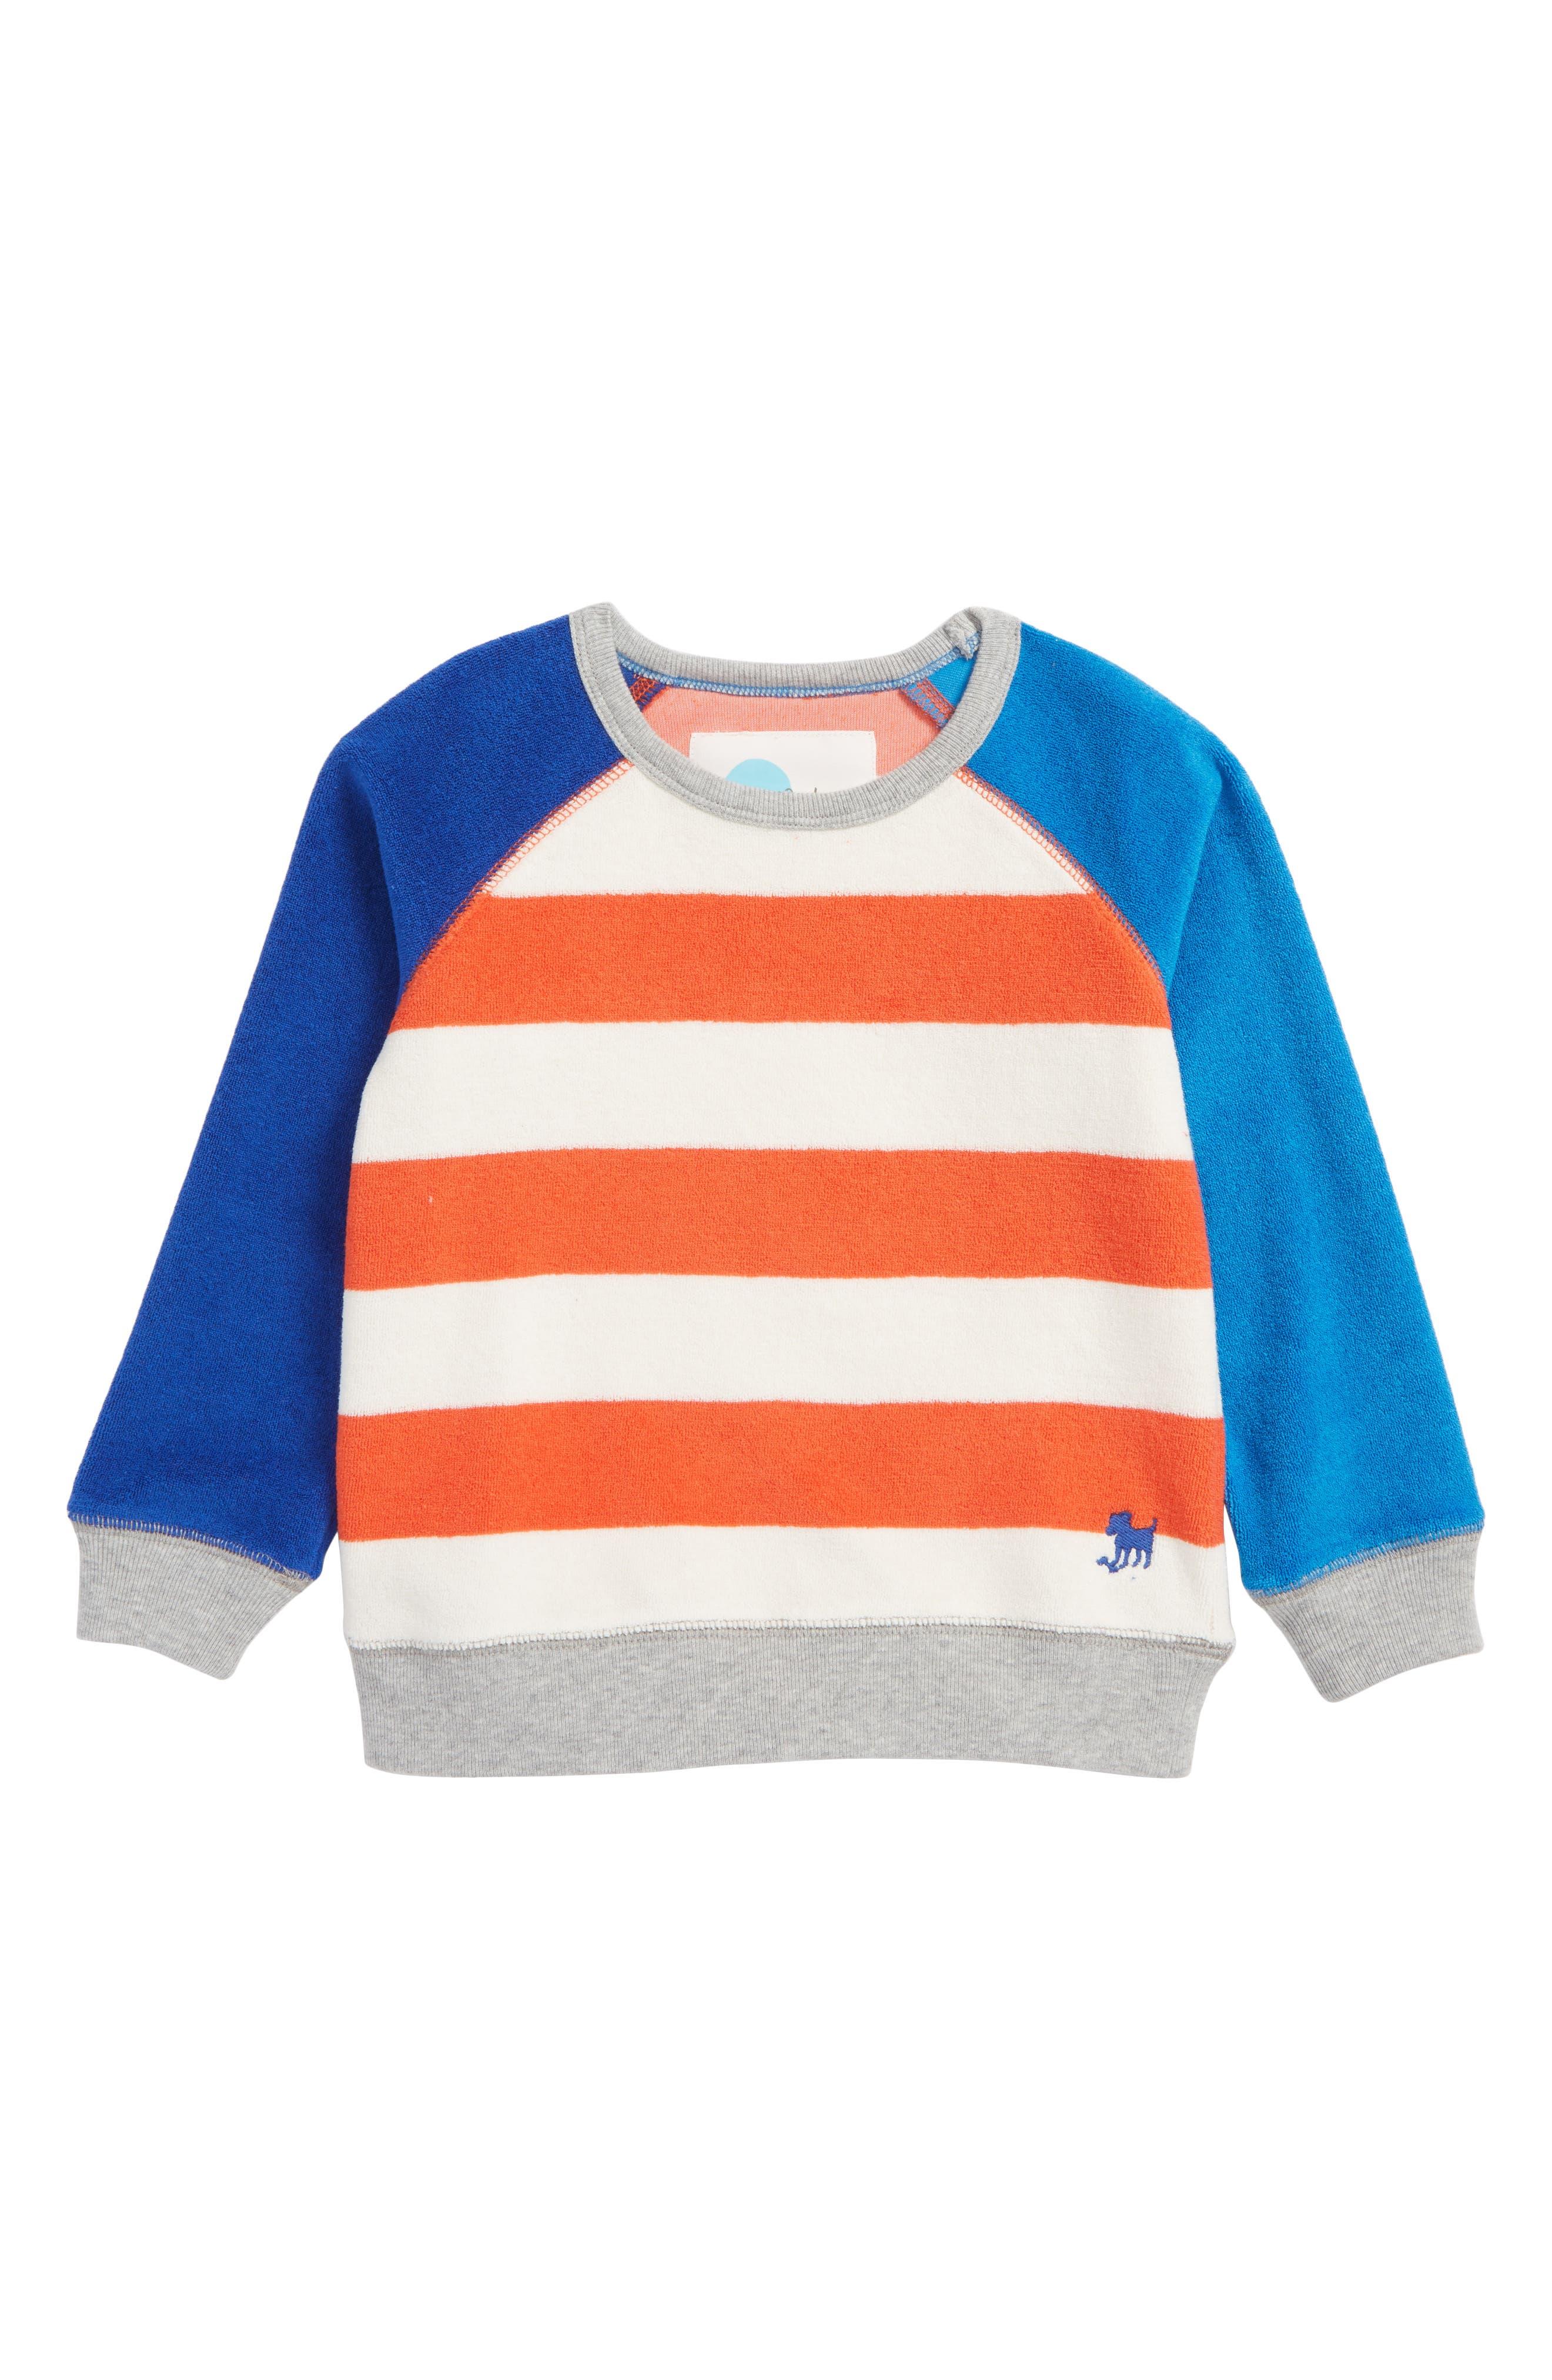 Stripe Toweling Sweatshirt,                         Main,                         color, 600